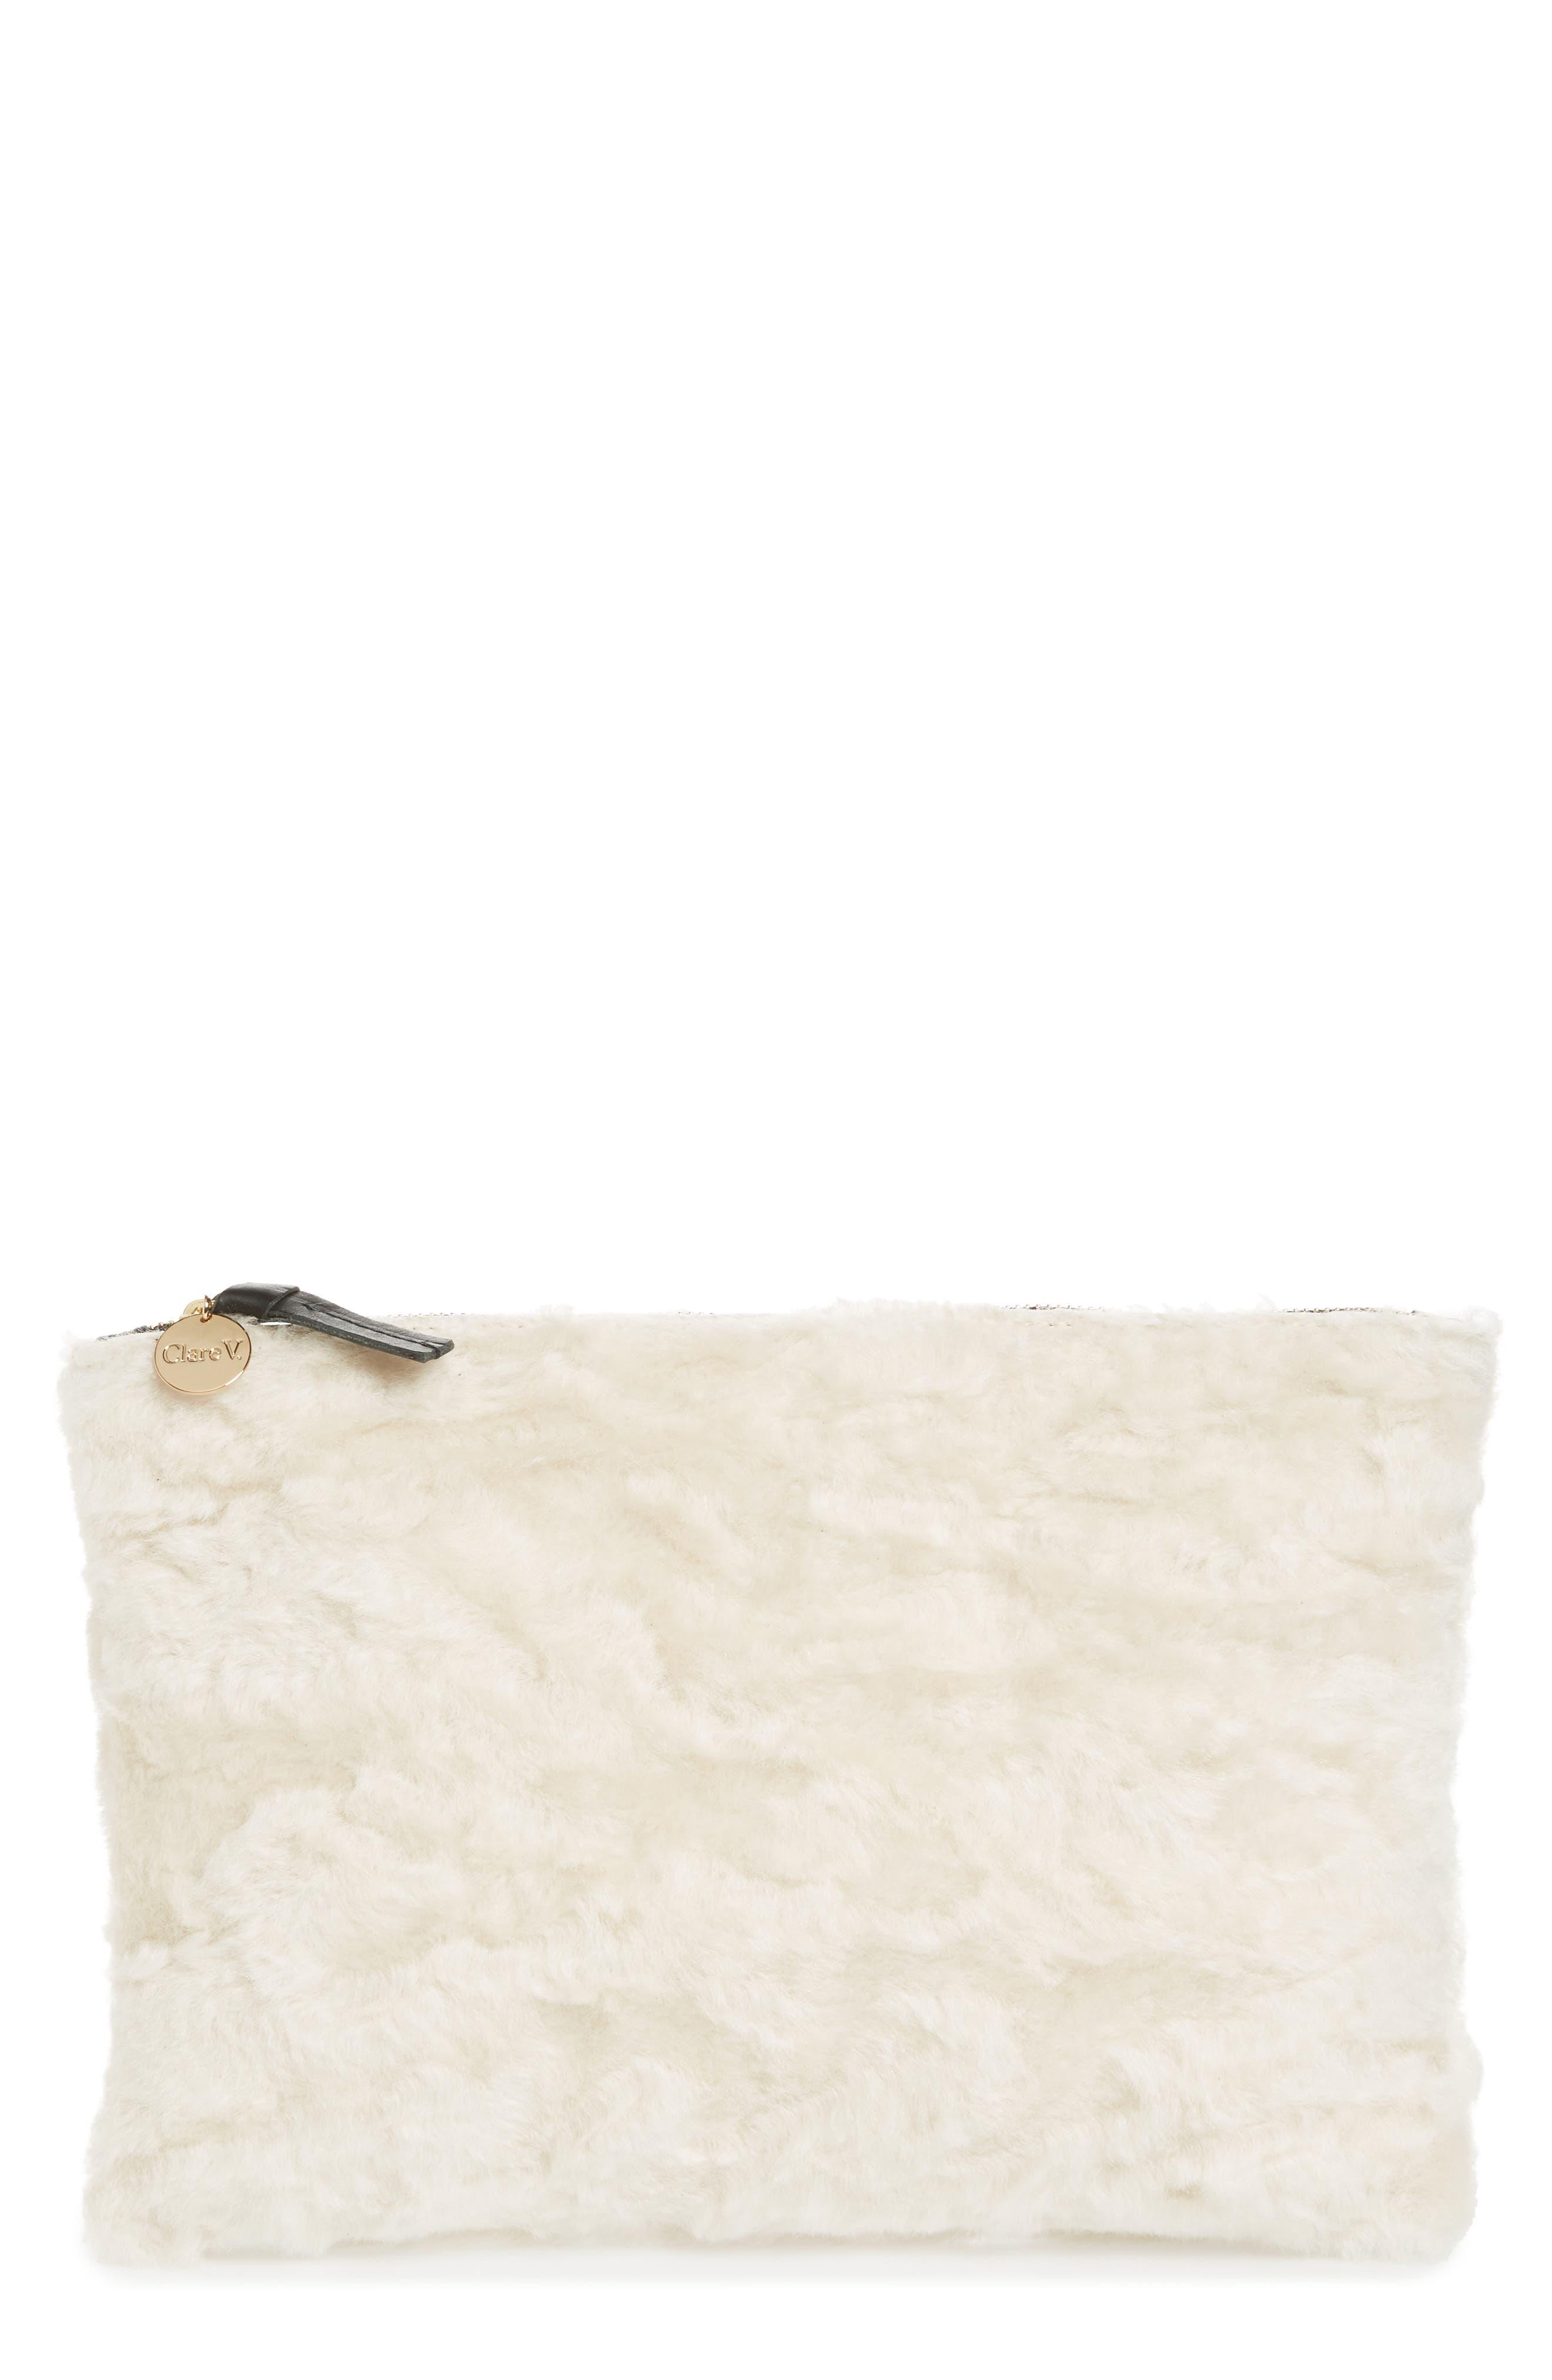 Genuine Shearling Flat Clutch,                             Main thumbnail 1, color,                             Cream Shearling